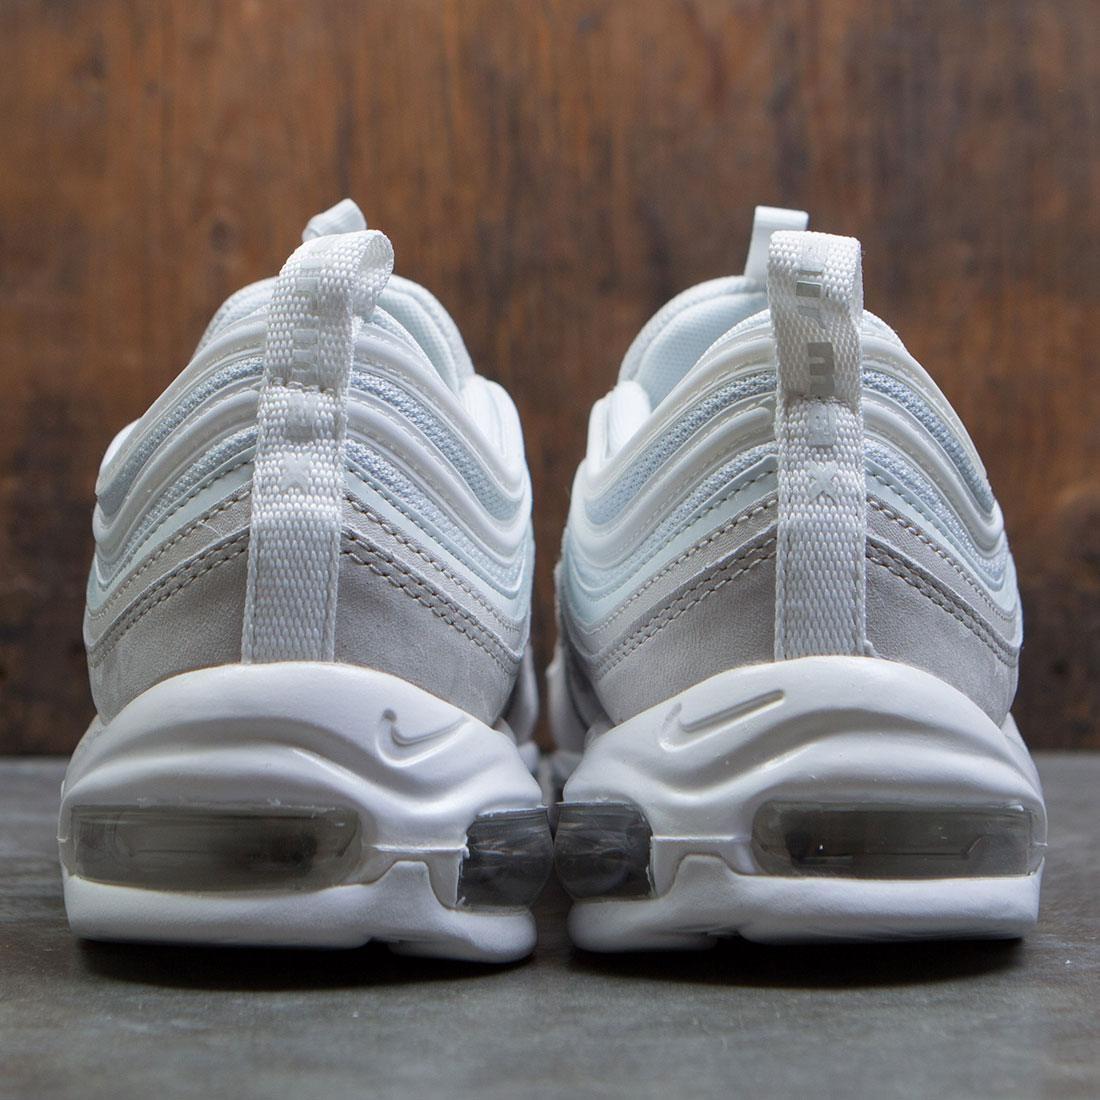 best sneakers 0a0a3 effb0 Cheap Nike Air Max 97 Ultra '17 Sportscene